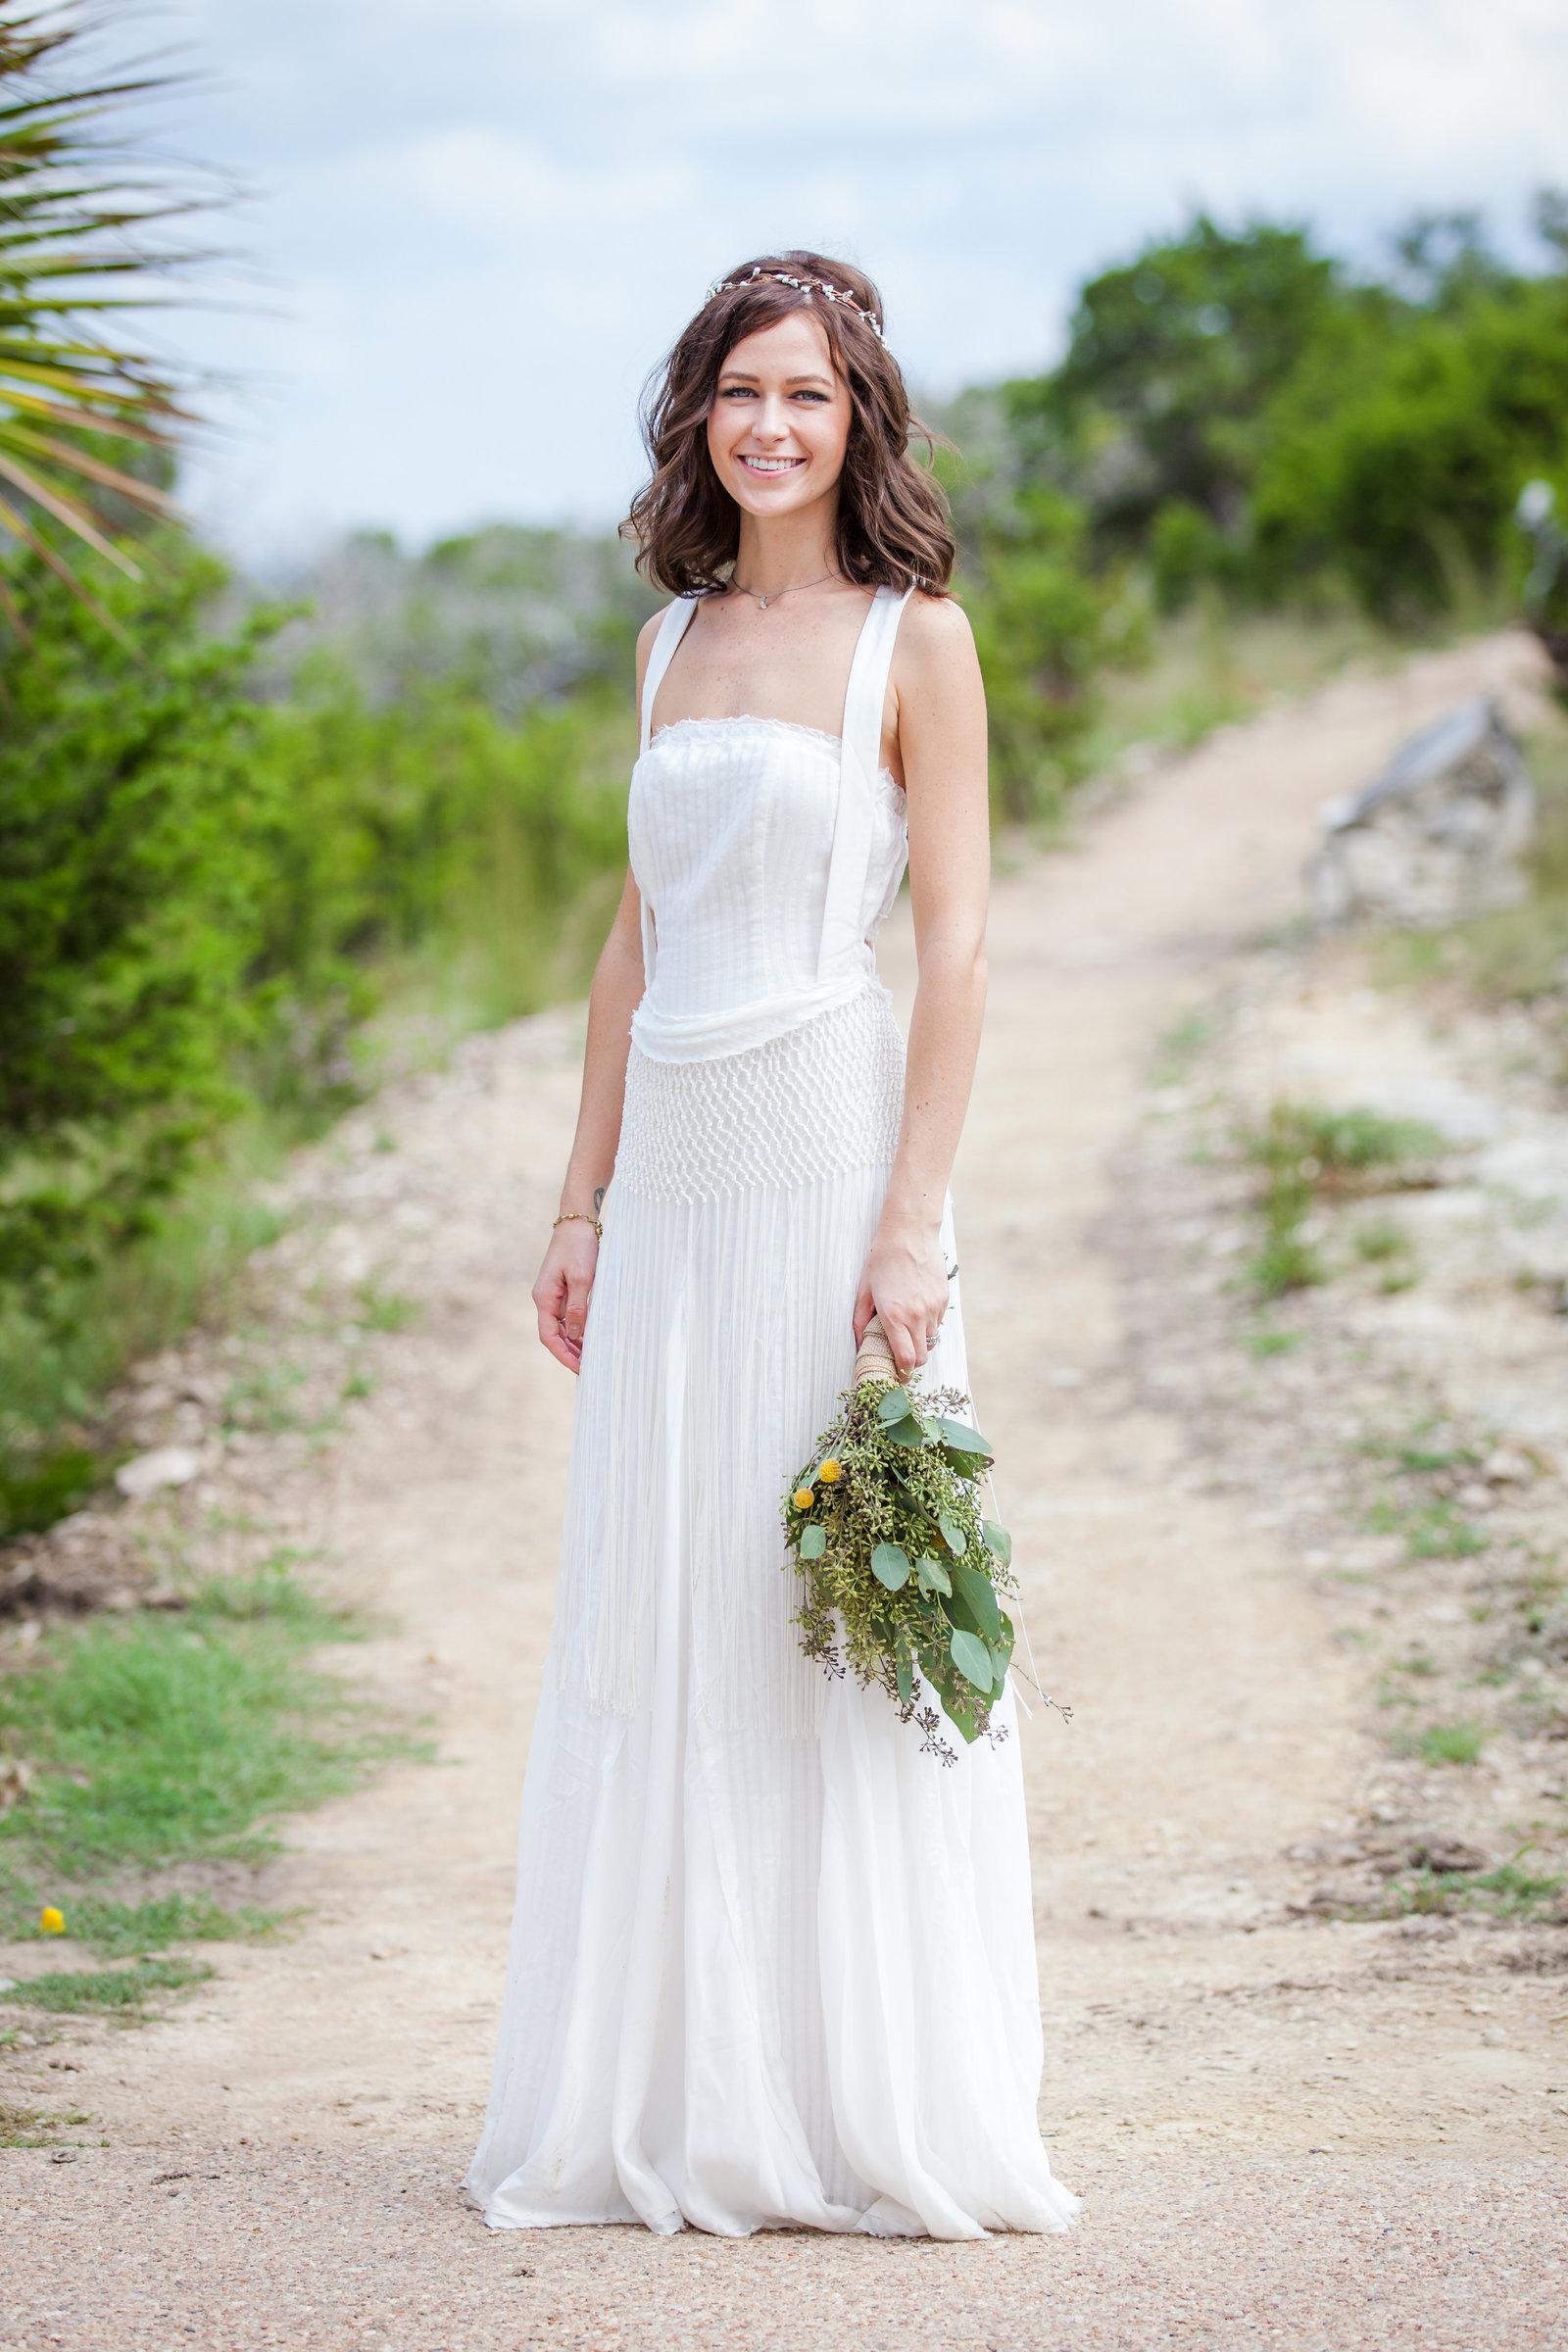 Austin Family Photographer, Tiffany Chapman, bride portrait photo